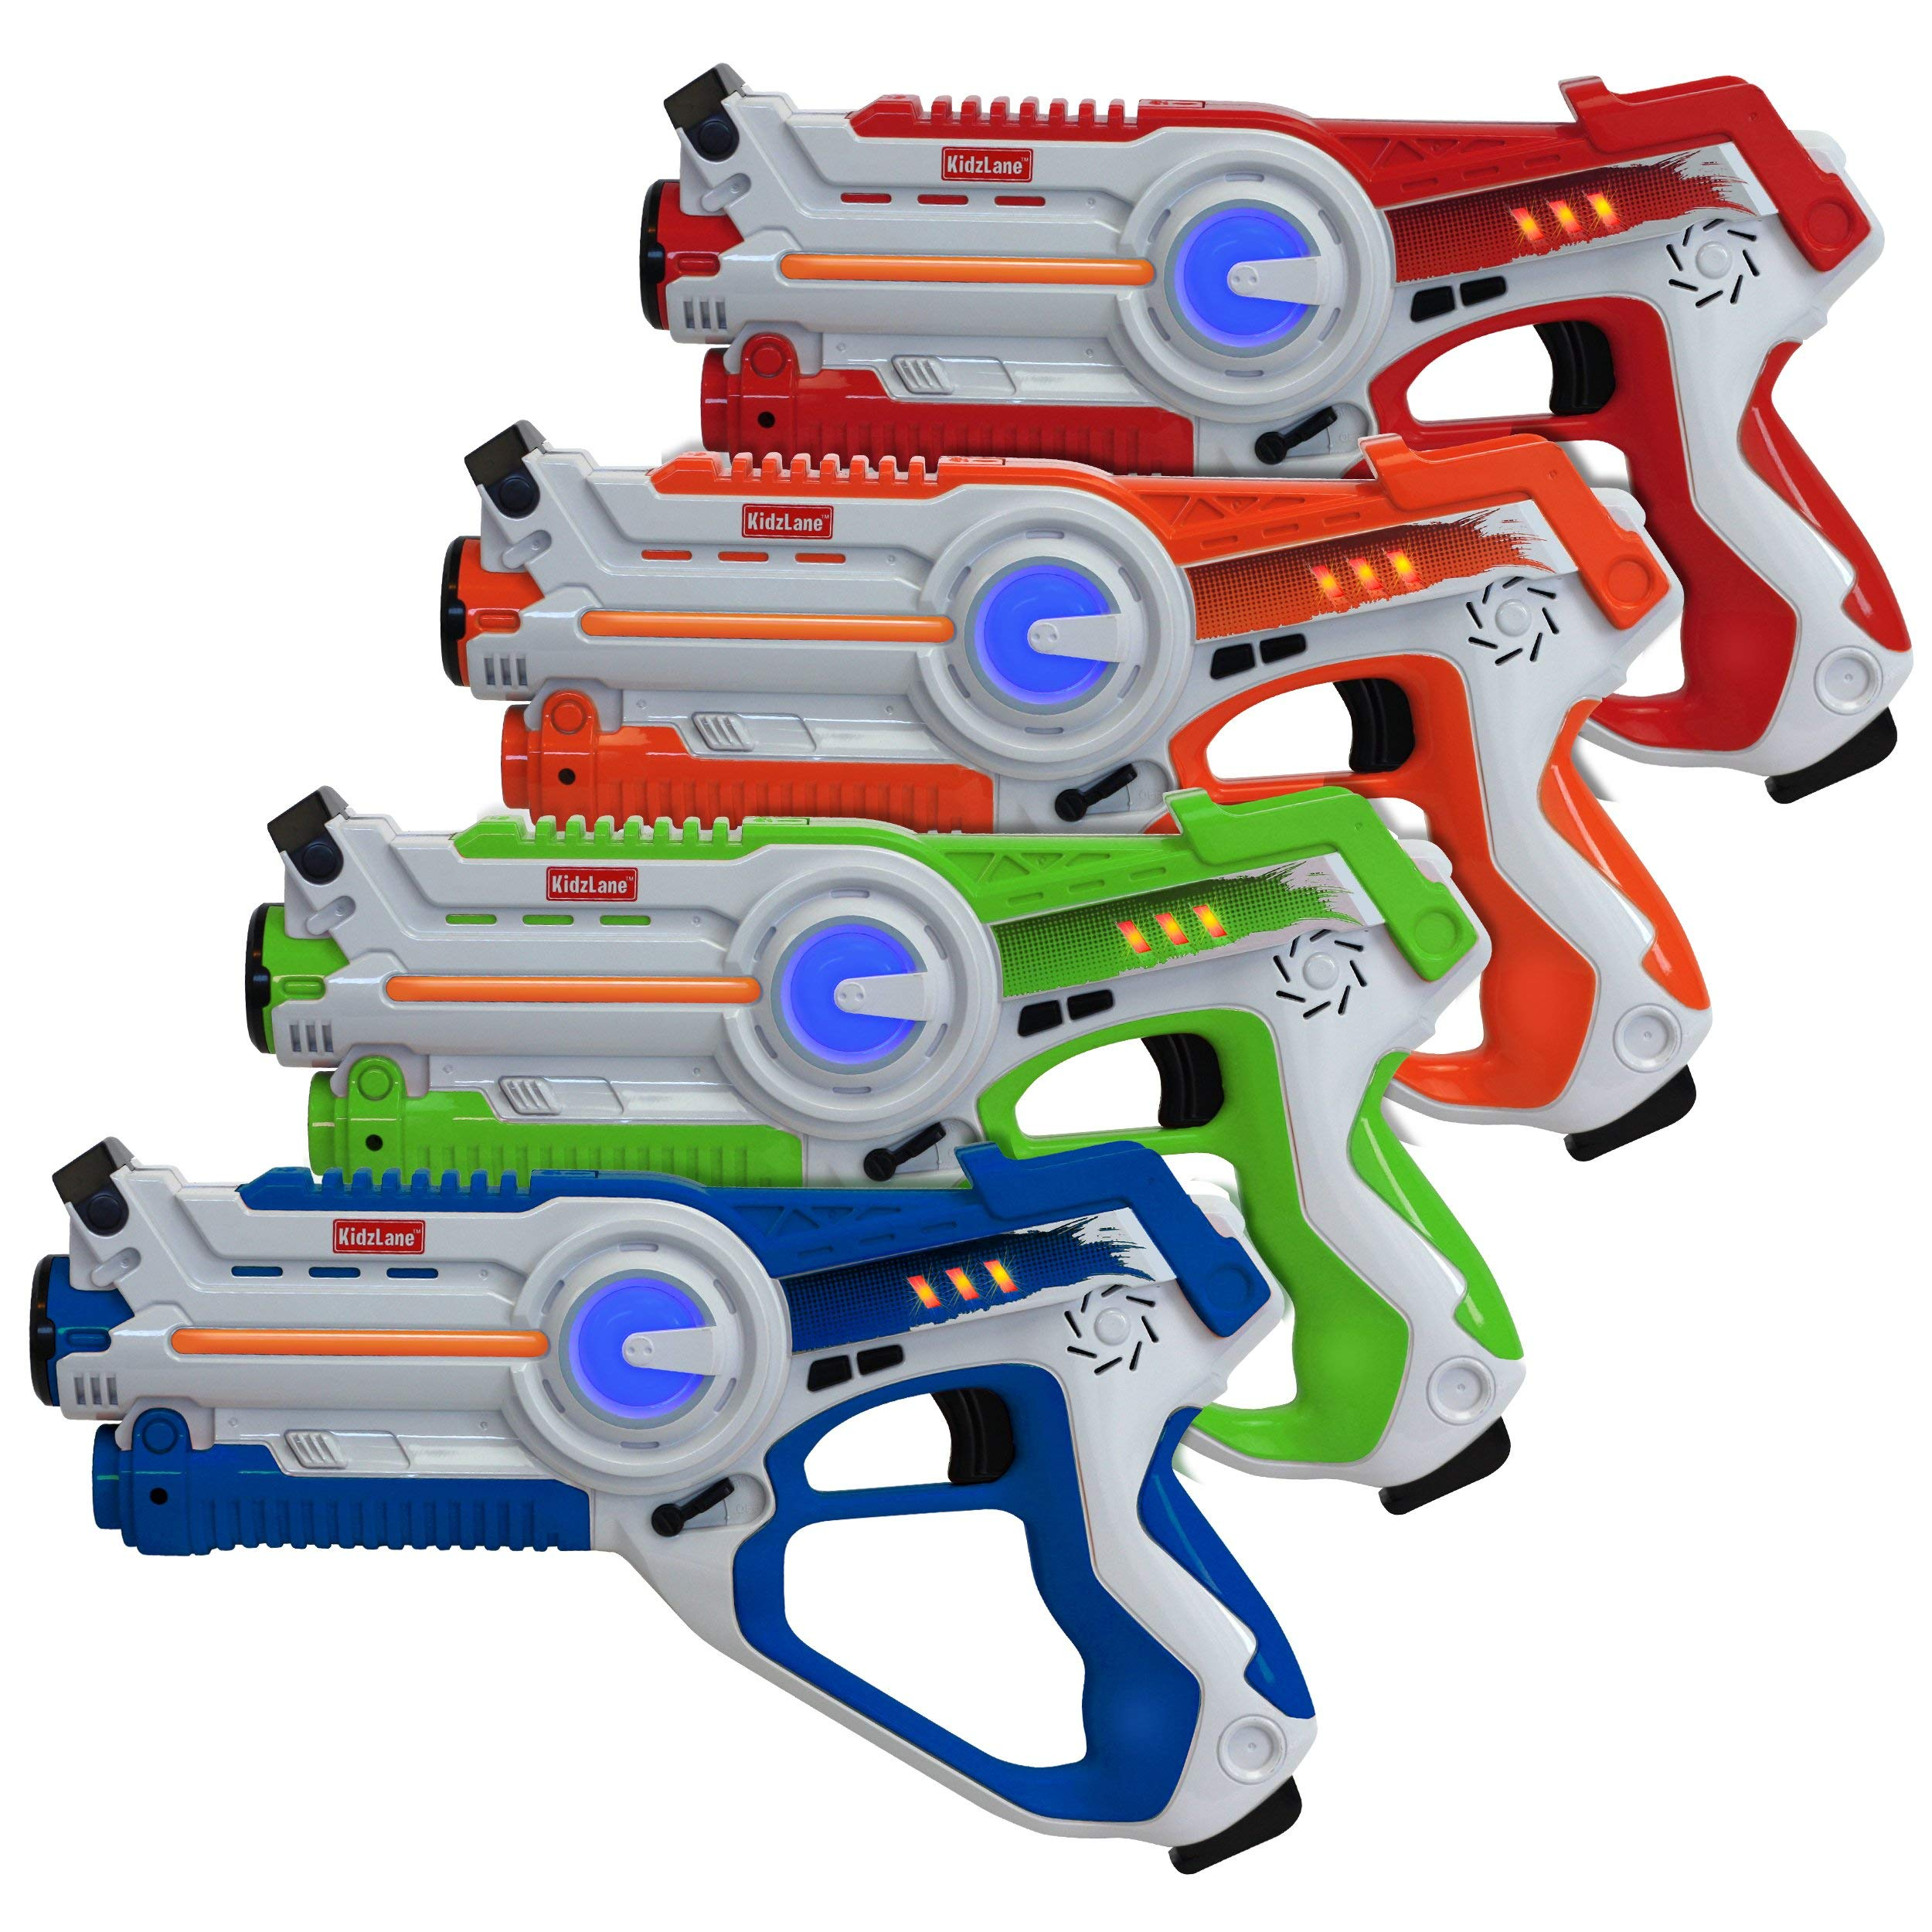 Kidzlane Infrared Laser Tag : Game Mega Pack - Set of 4 Players - Infrared Laser Gun Indoor and Outdoor Group Activity Fun. Infrared 0.9mW (Renewed) by Kidzlane